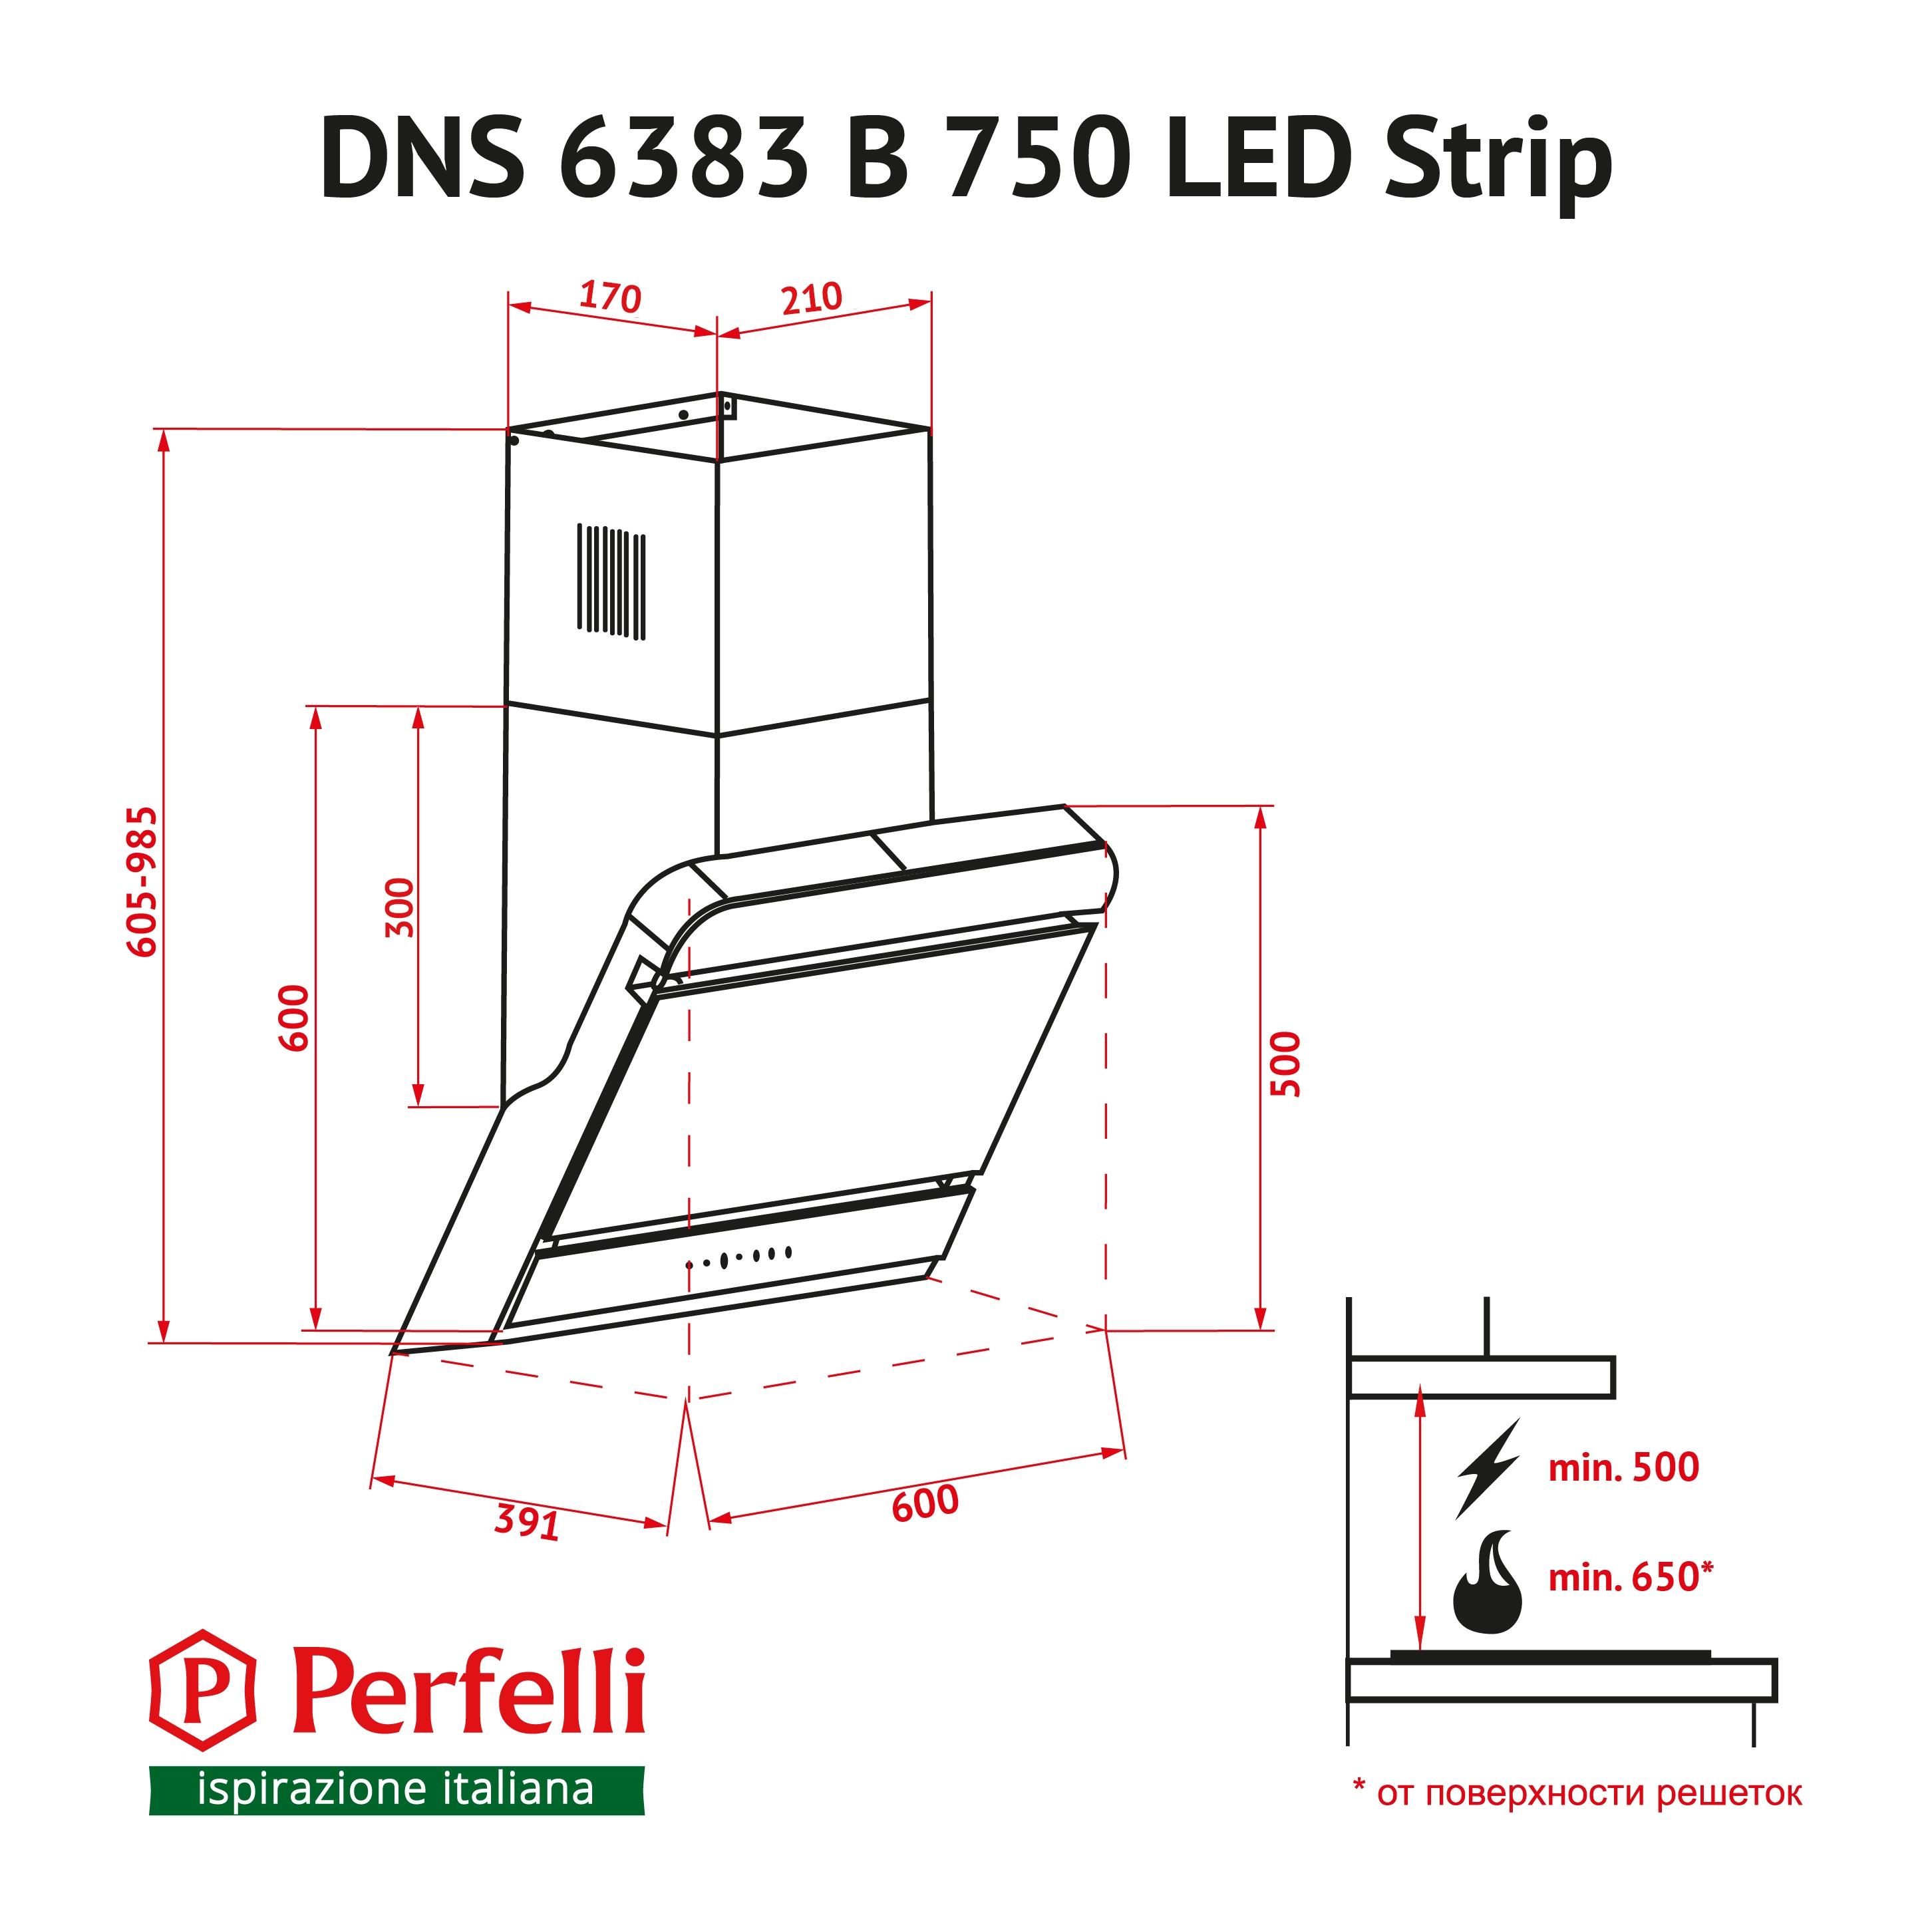 Decorative Incline Hood Perfelli DNS 6383 B 750 BL LED Strip